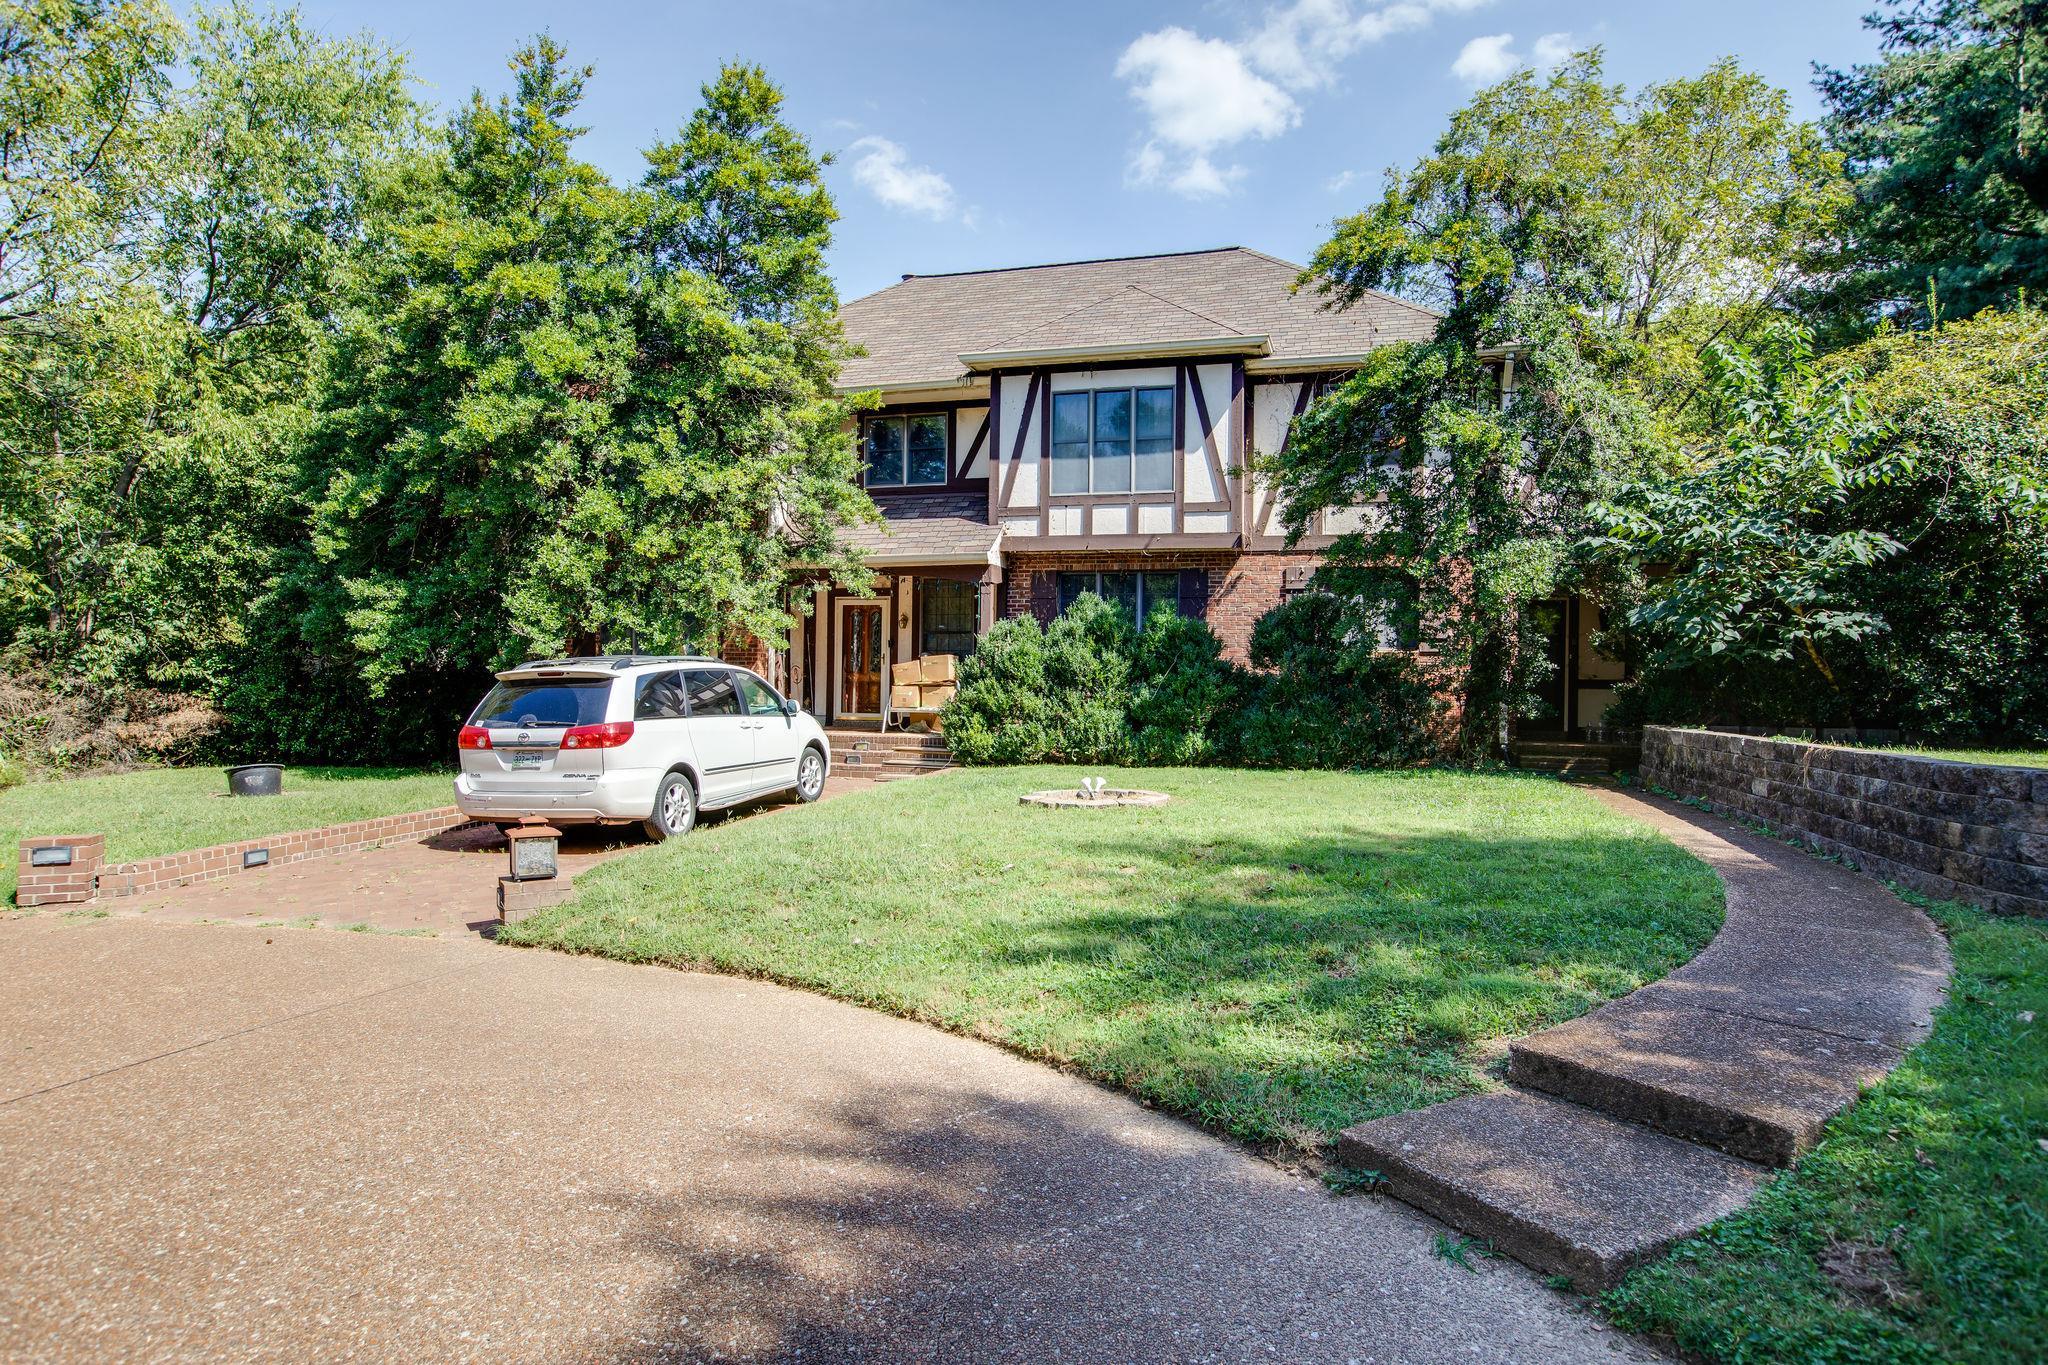 4780 Lealand Ln, Nashville, TN 37220 - Nashville, TN real estate listing